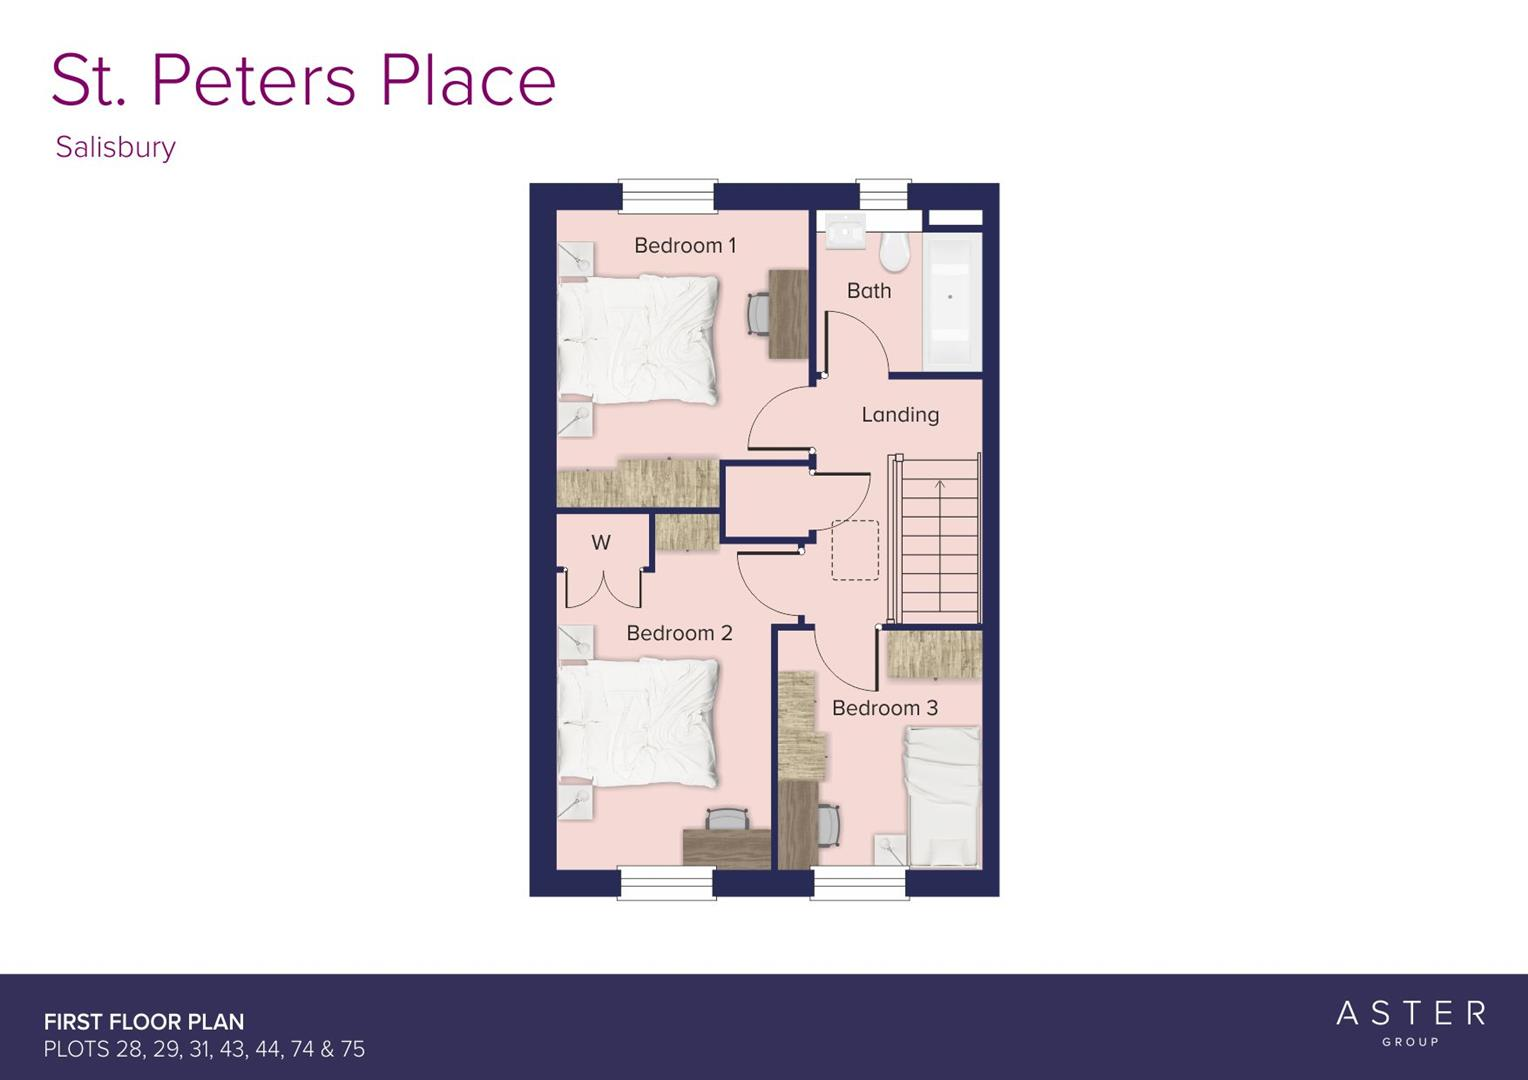 24966 St Peters Place Salisbury 600x600 FB.jpg